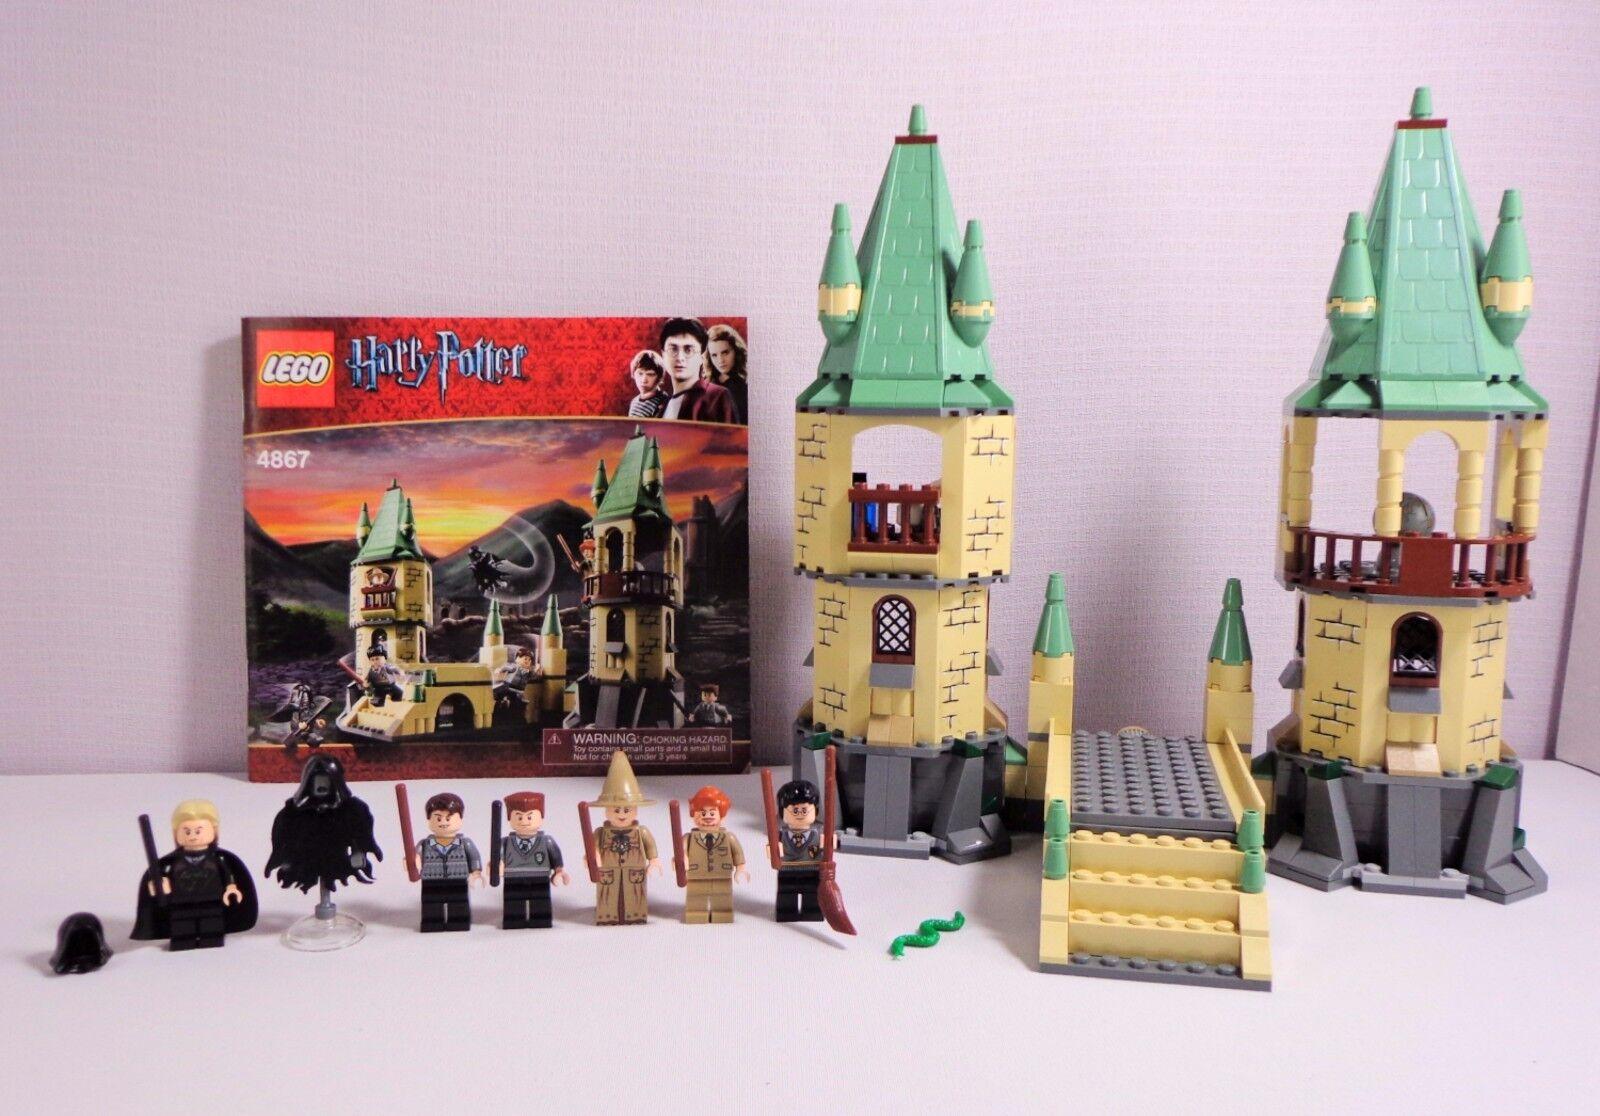 Lego  Harry Potter Set Hogwarts 4867 Dementor Malfoy Neville Sprout Lupin Goyle  economico e di alta qualità